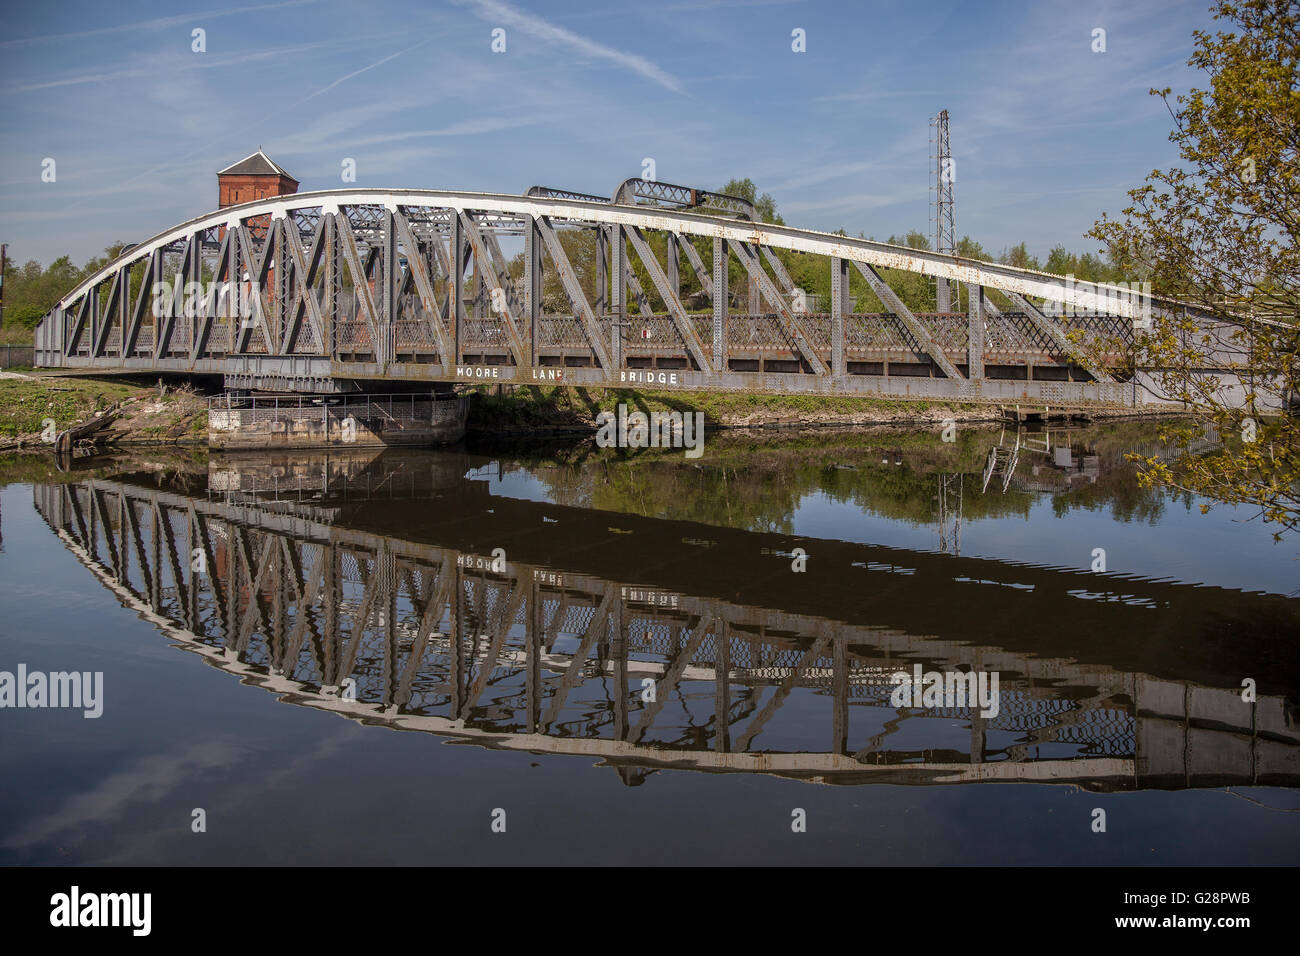 Manchester ship canal swing bridge at Moore near Warrington. - Stock Image